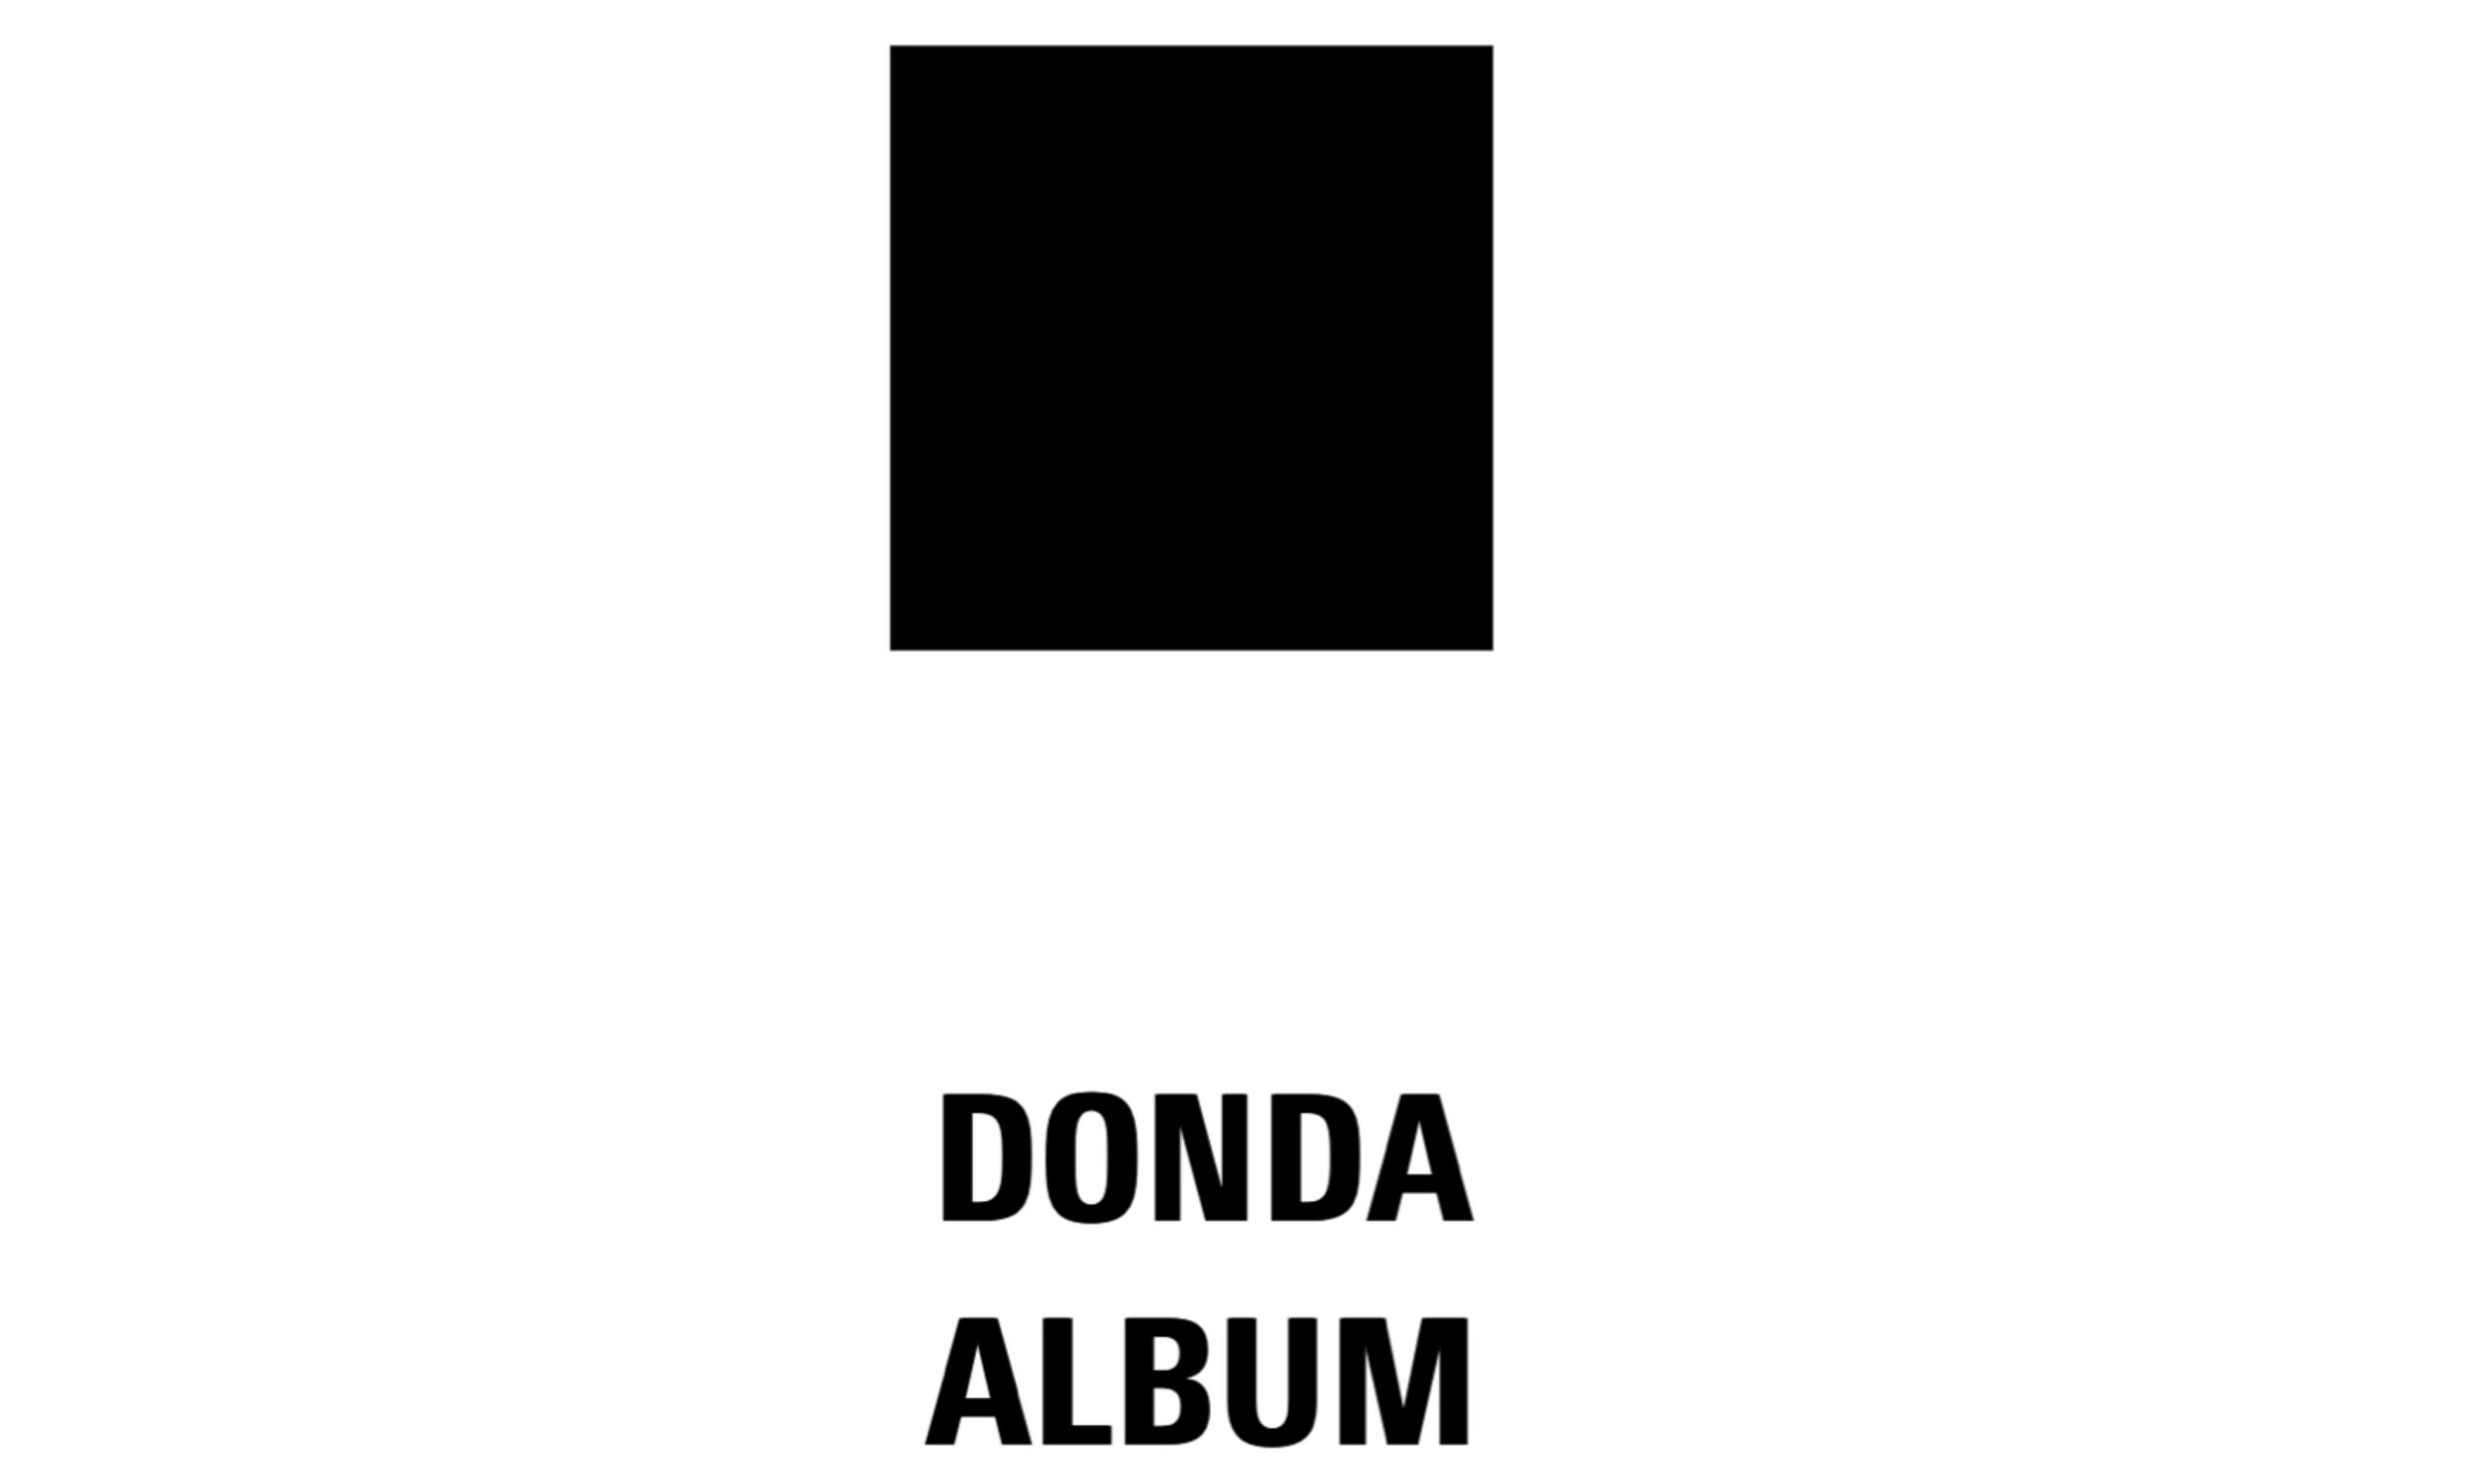 Kanye West 推出与 BALENCIAGA 合作 DONDA 周边产品